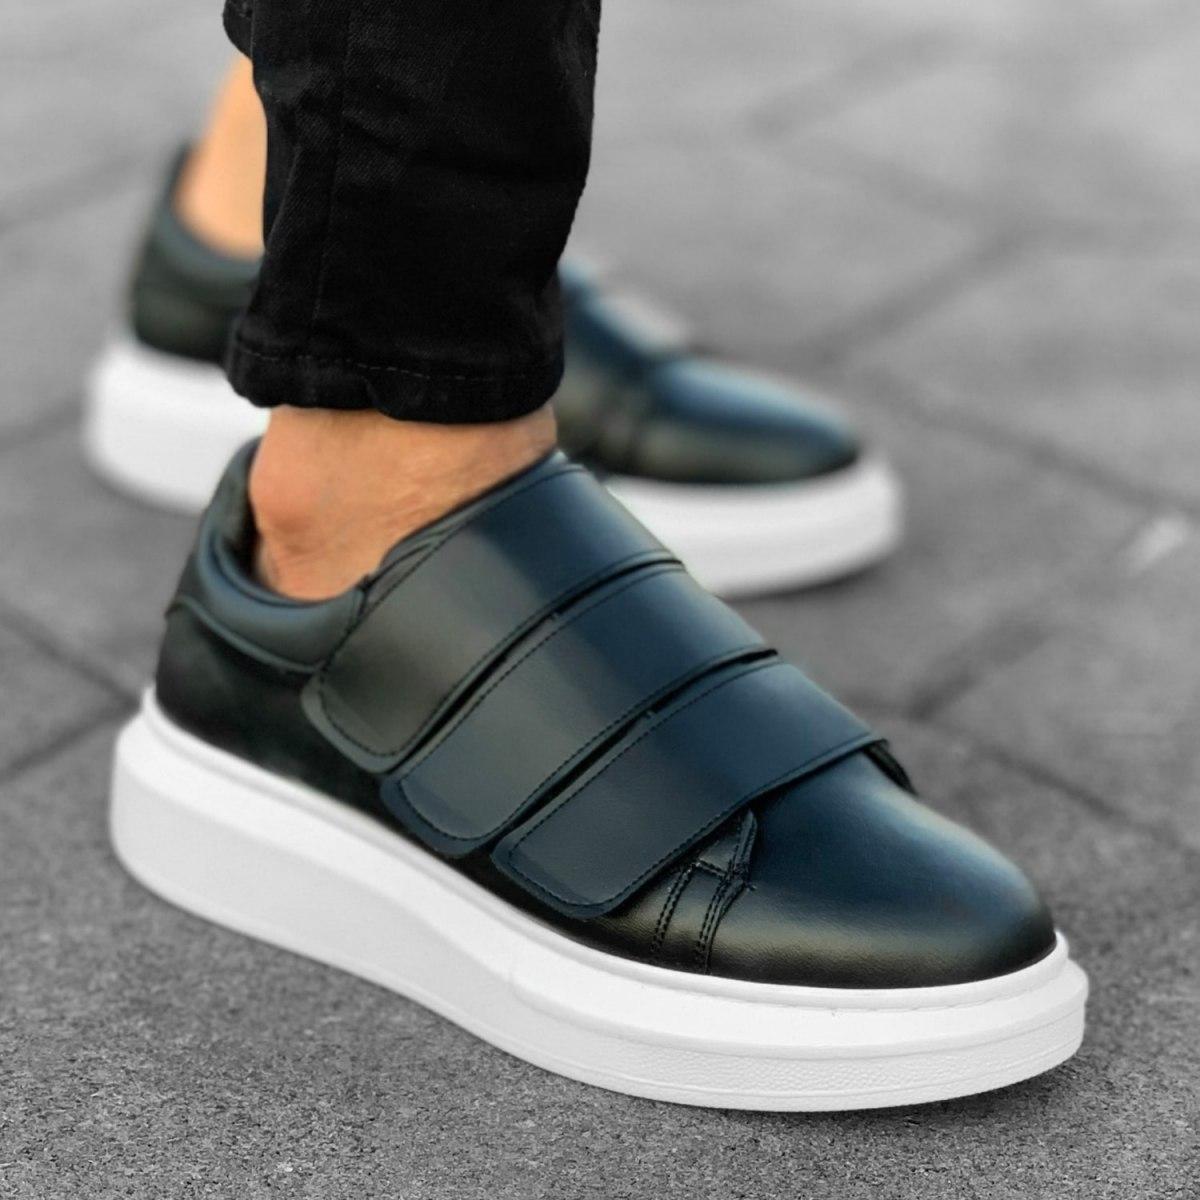 Triple Velcro Sneakers in Black-White